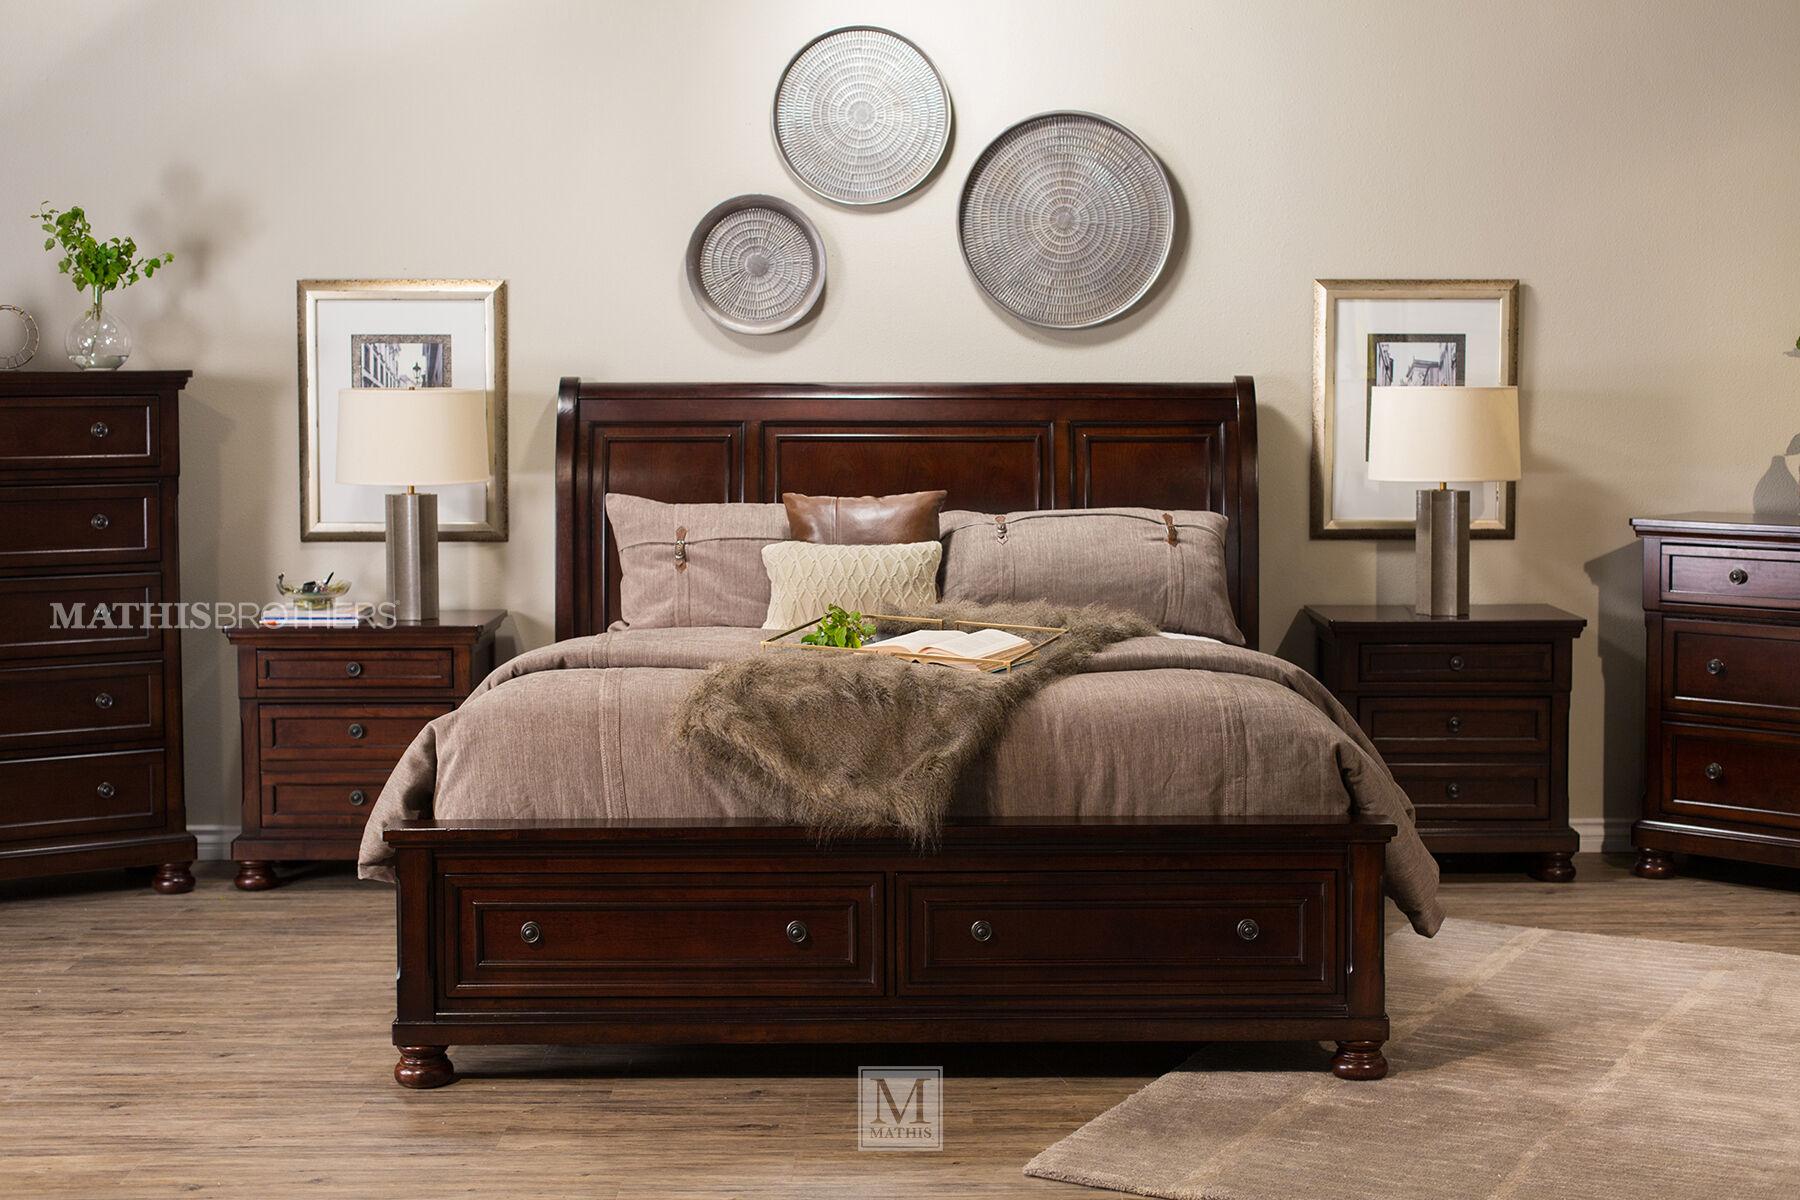 ashley furniture porter sleigh bed set furniture ideas rh ecomgain com ashley porter bedroom set king price ashley porter bedroom suite